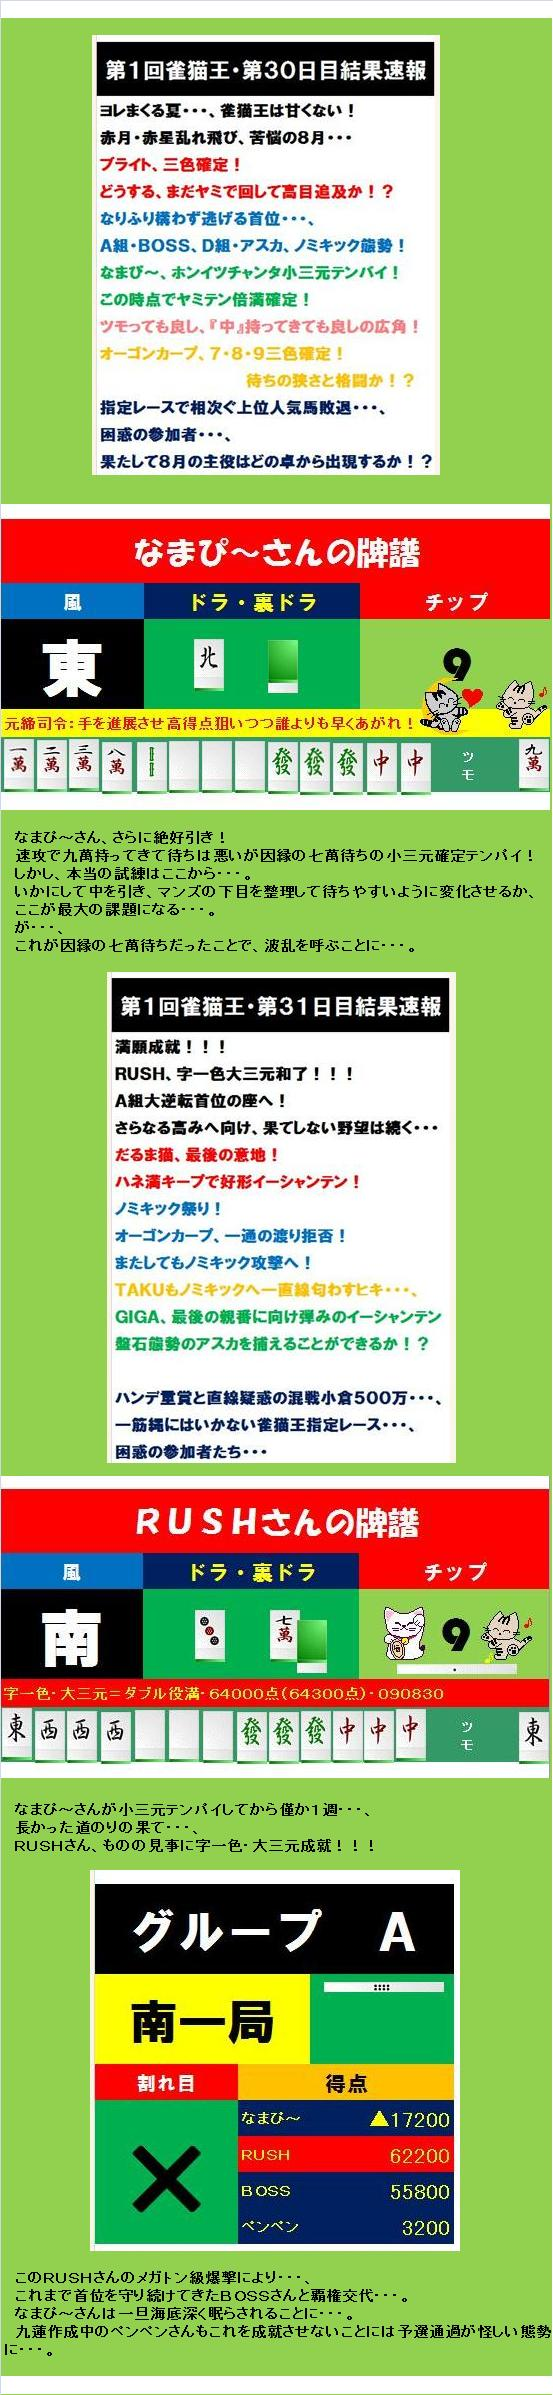 20100226・A組回顧15.jpg